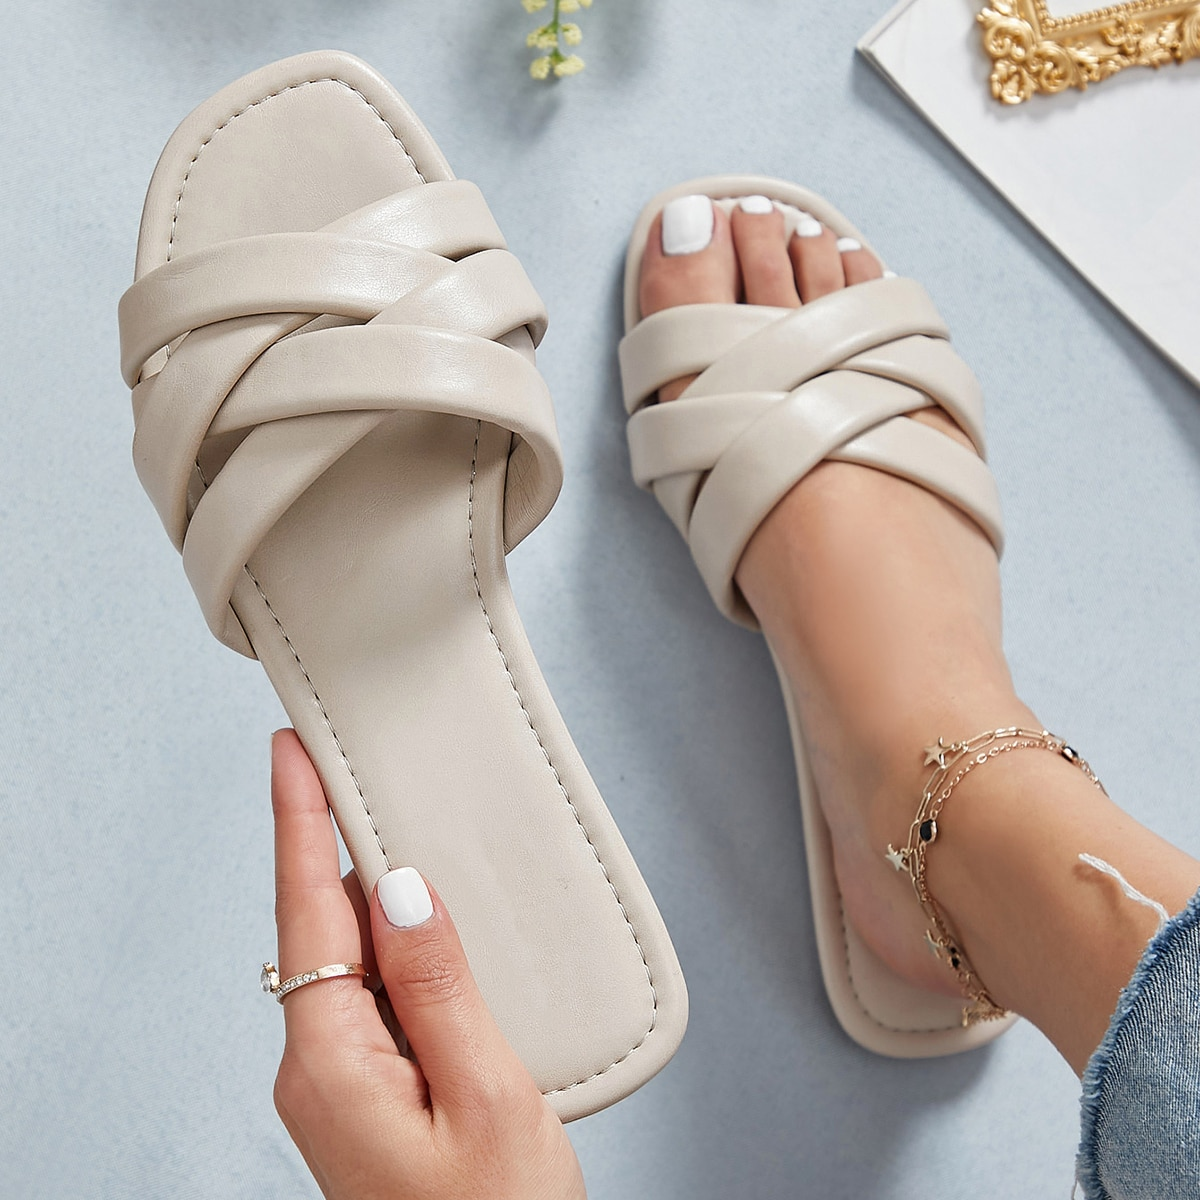 SHEIN / Faux Leather Crisscross Strap Sandals